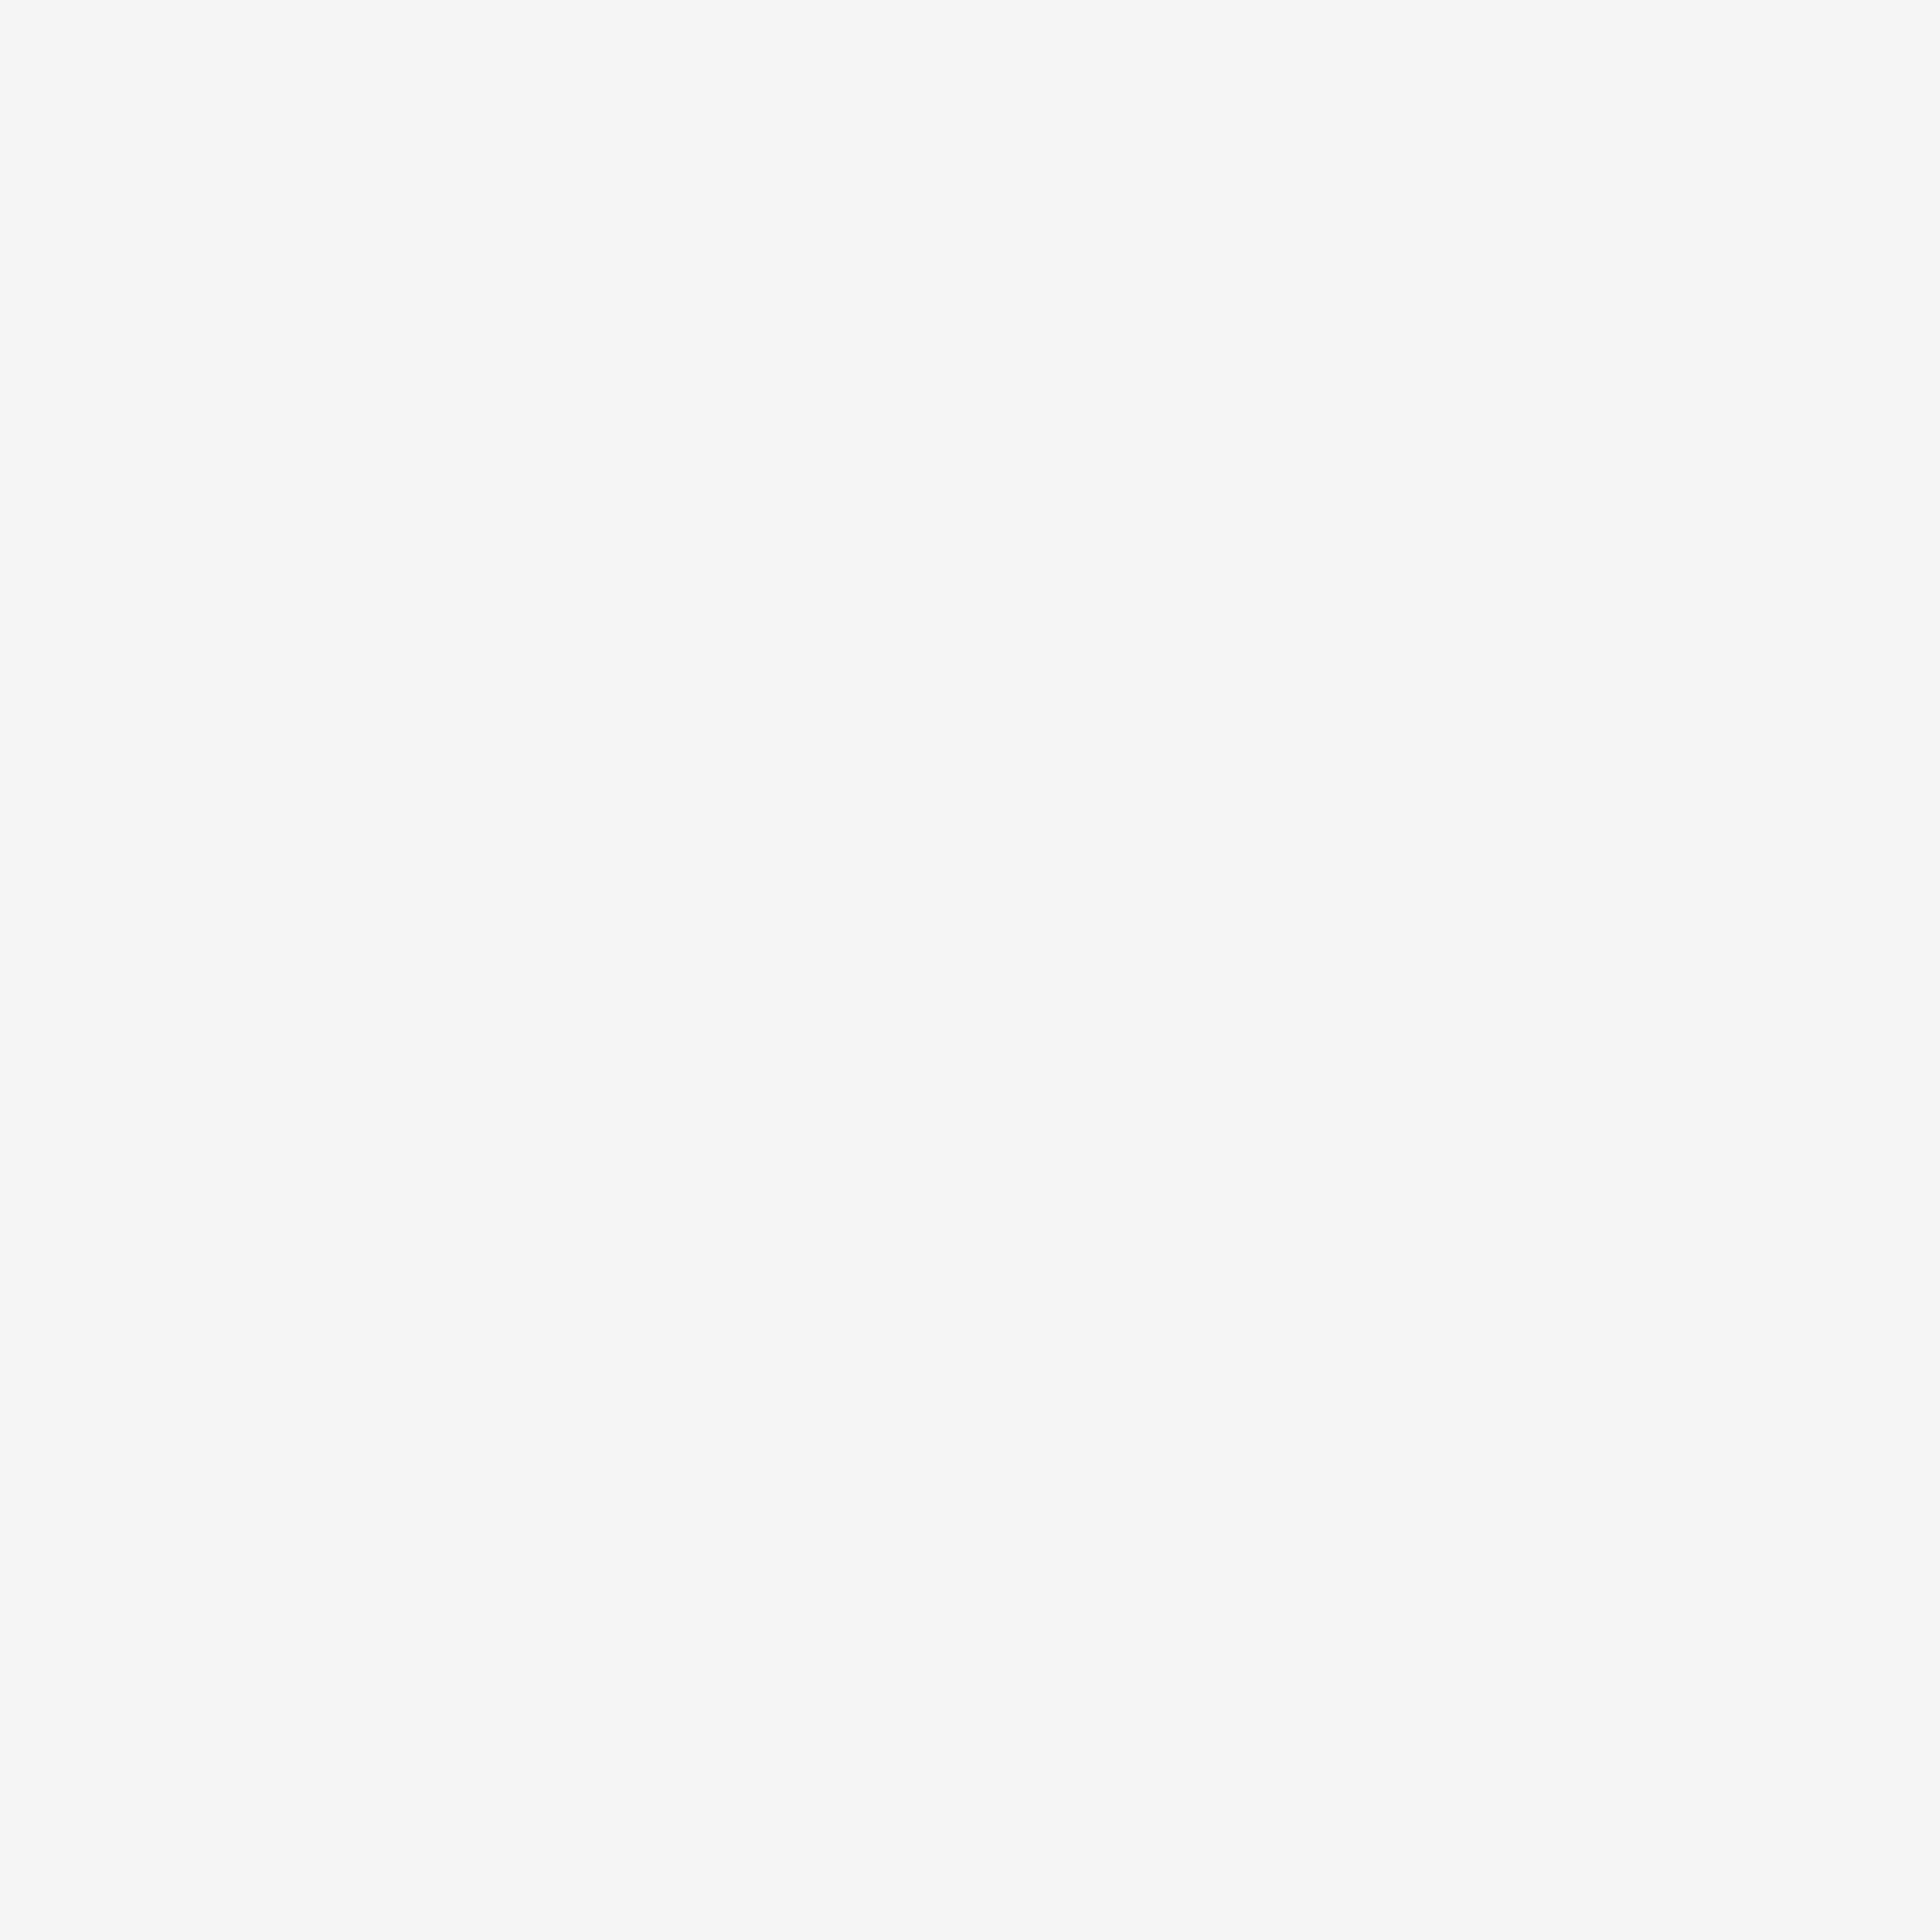 f6f69b9d6e6 Pinocchio 1109 order online   Oxener Shoes